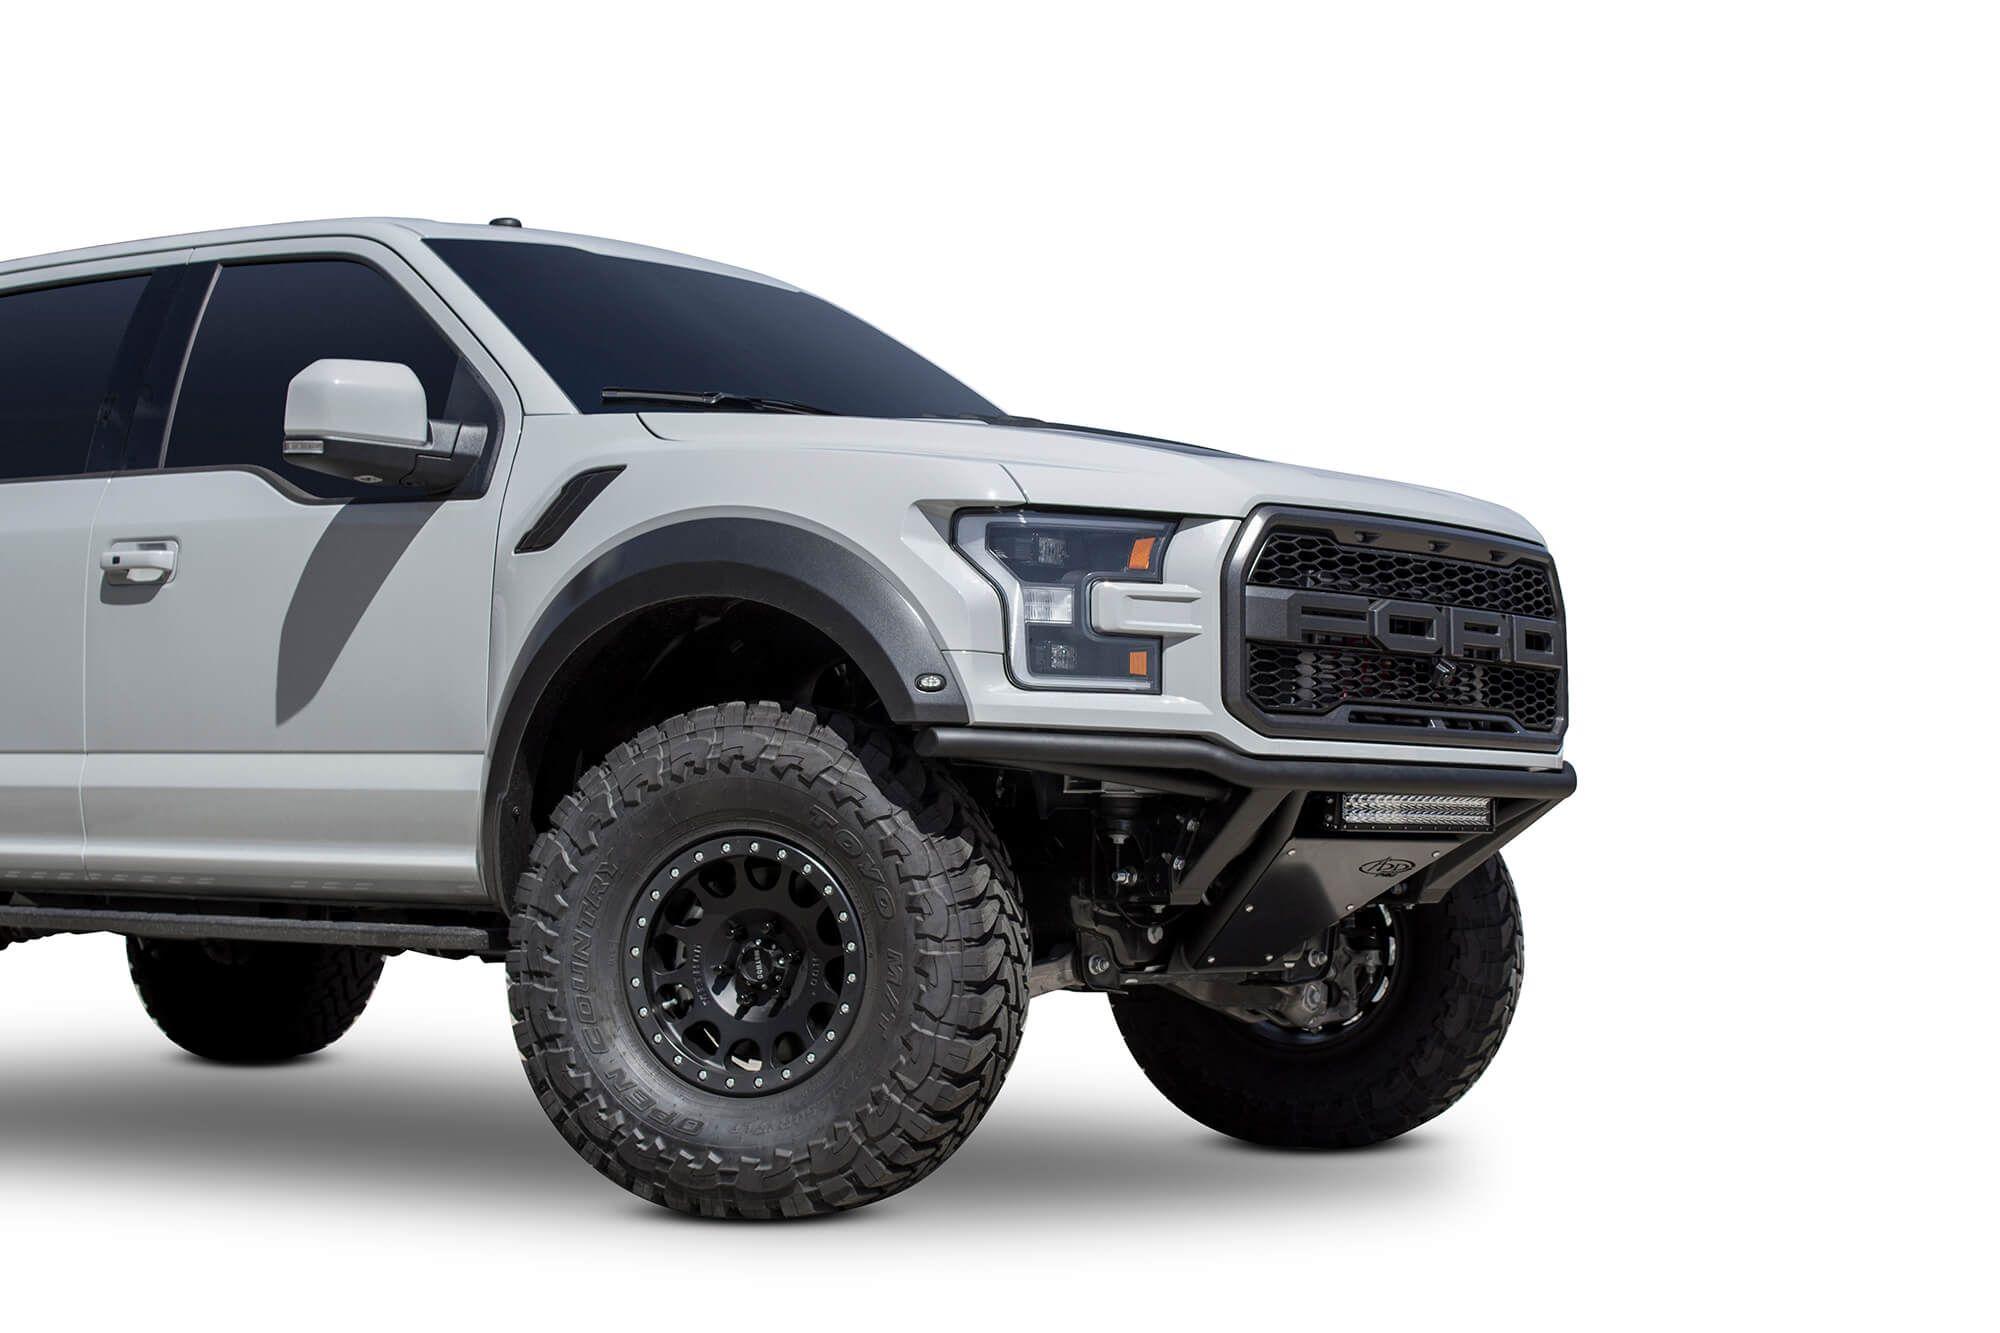 Add Pro Front Bumper Ford Raptor Ford Monster Trucks